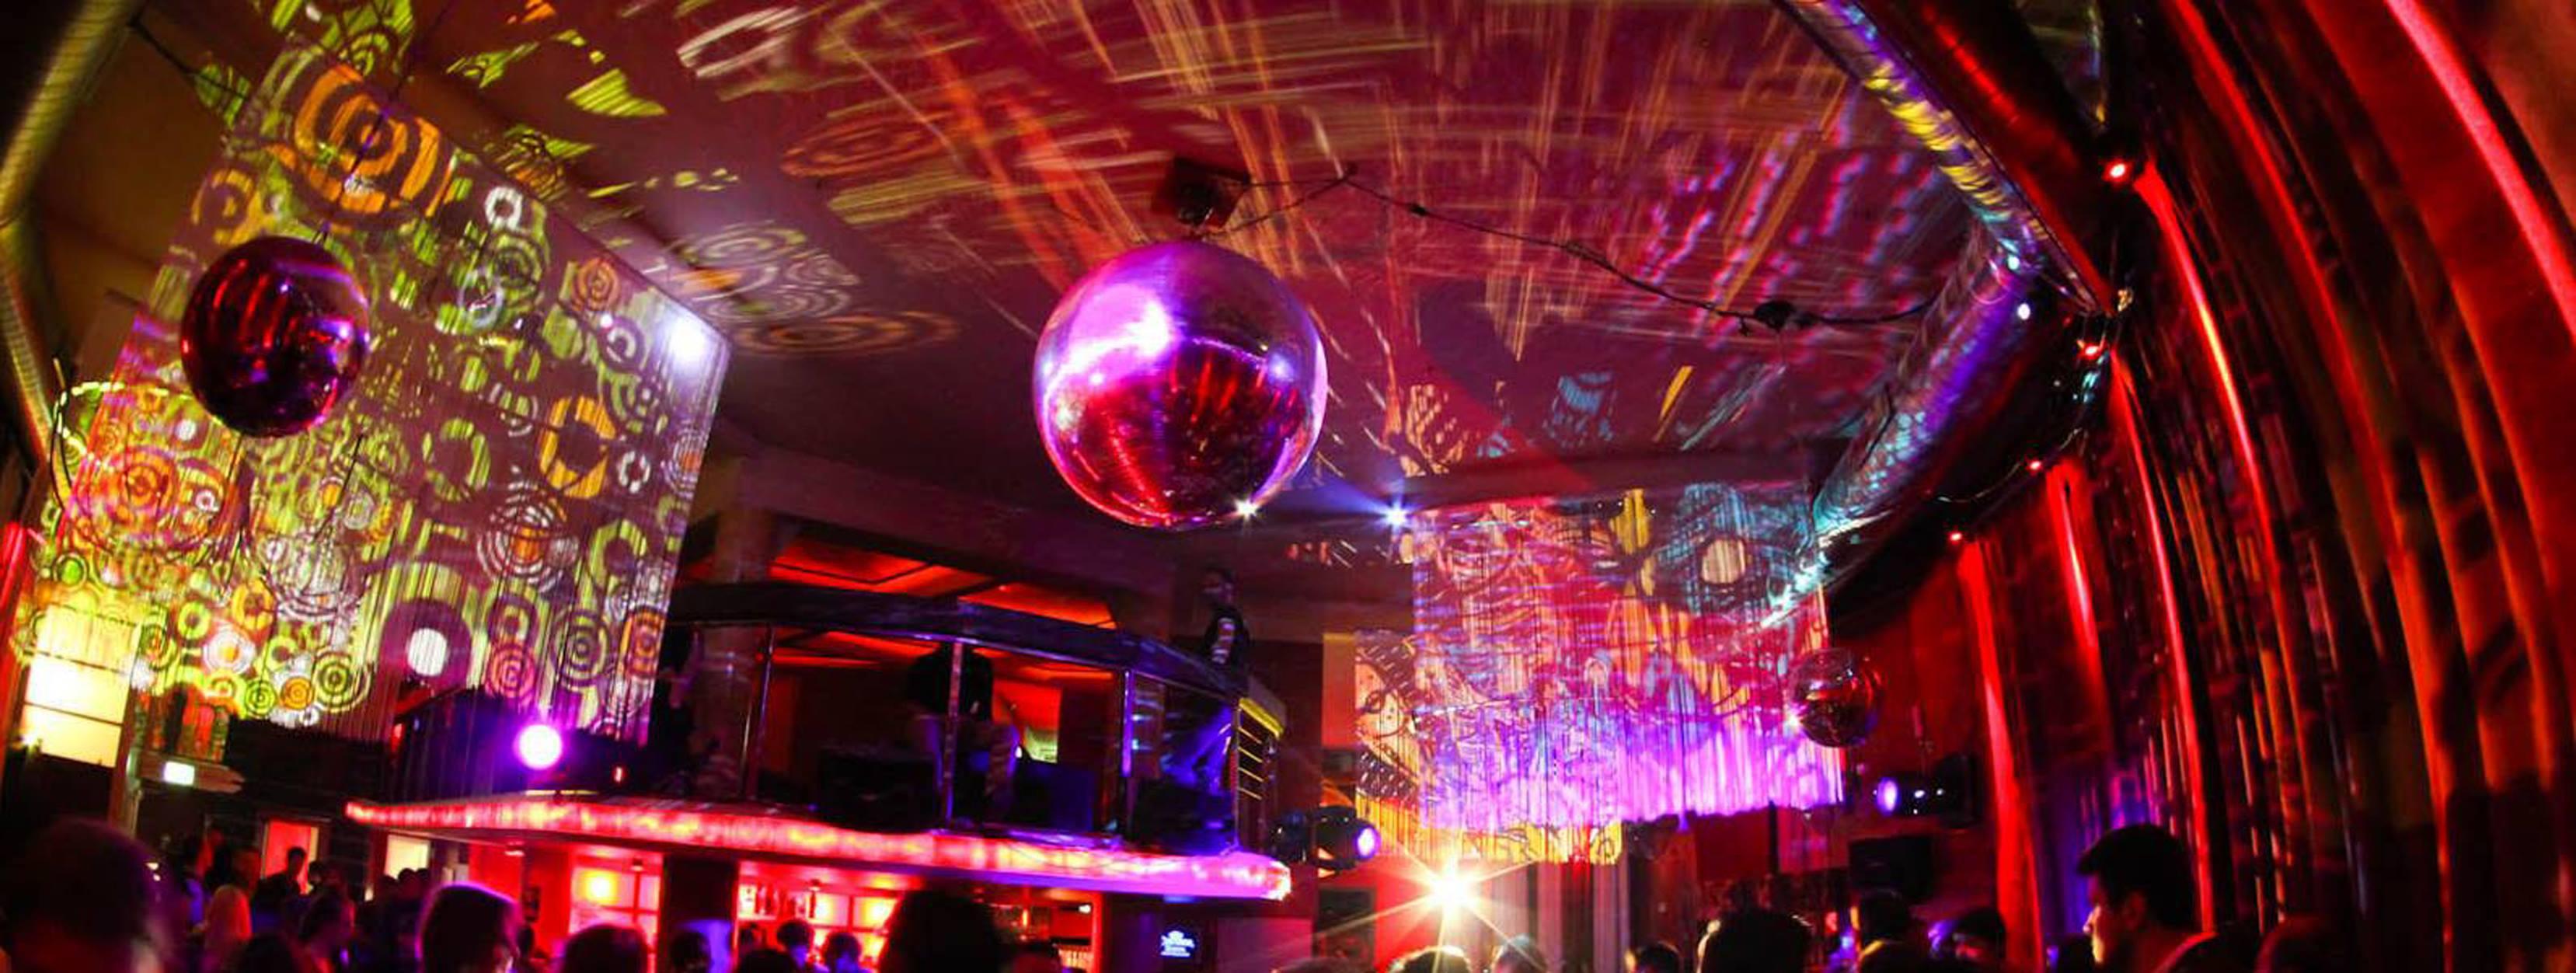 Cuba Libre Doppeldecker Party Presseklub Erfurt   Club Bar Lounge